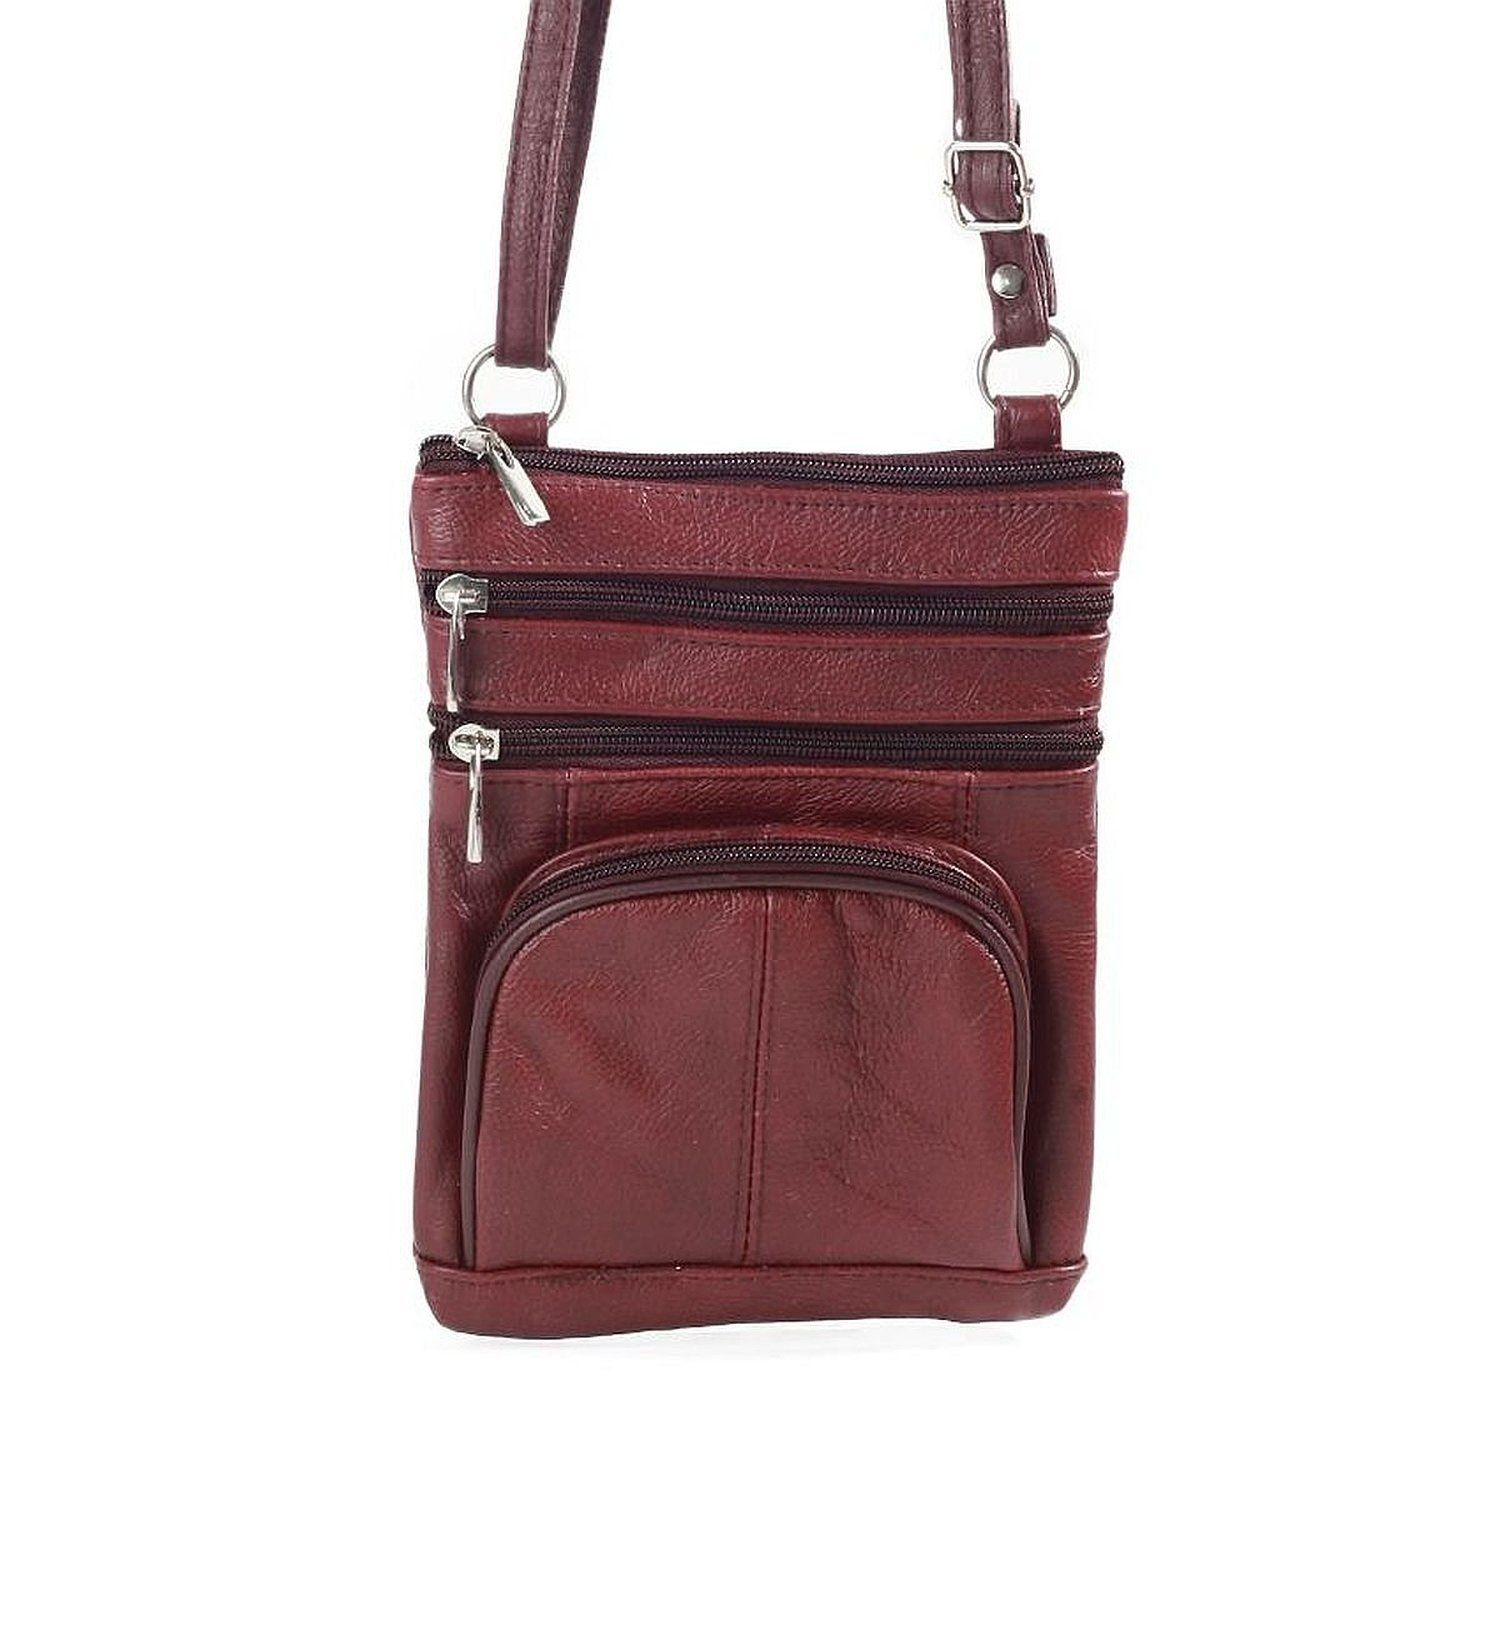 Roma Leathers Genuine Leather Multi-Pocket Crossbody Purse Bag Black